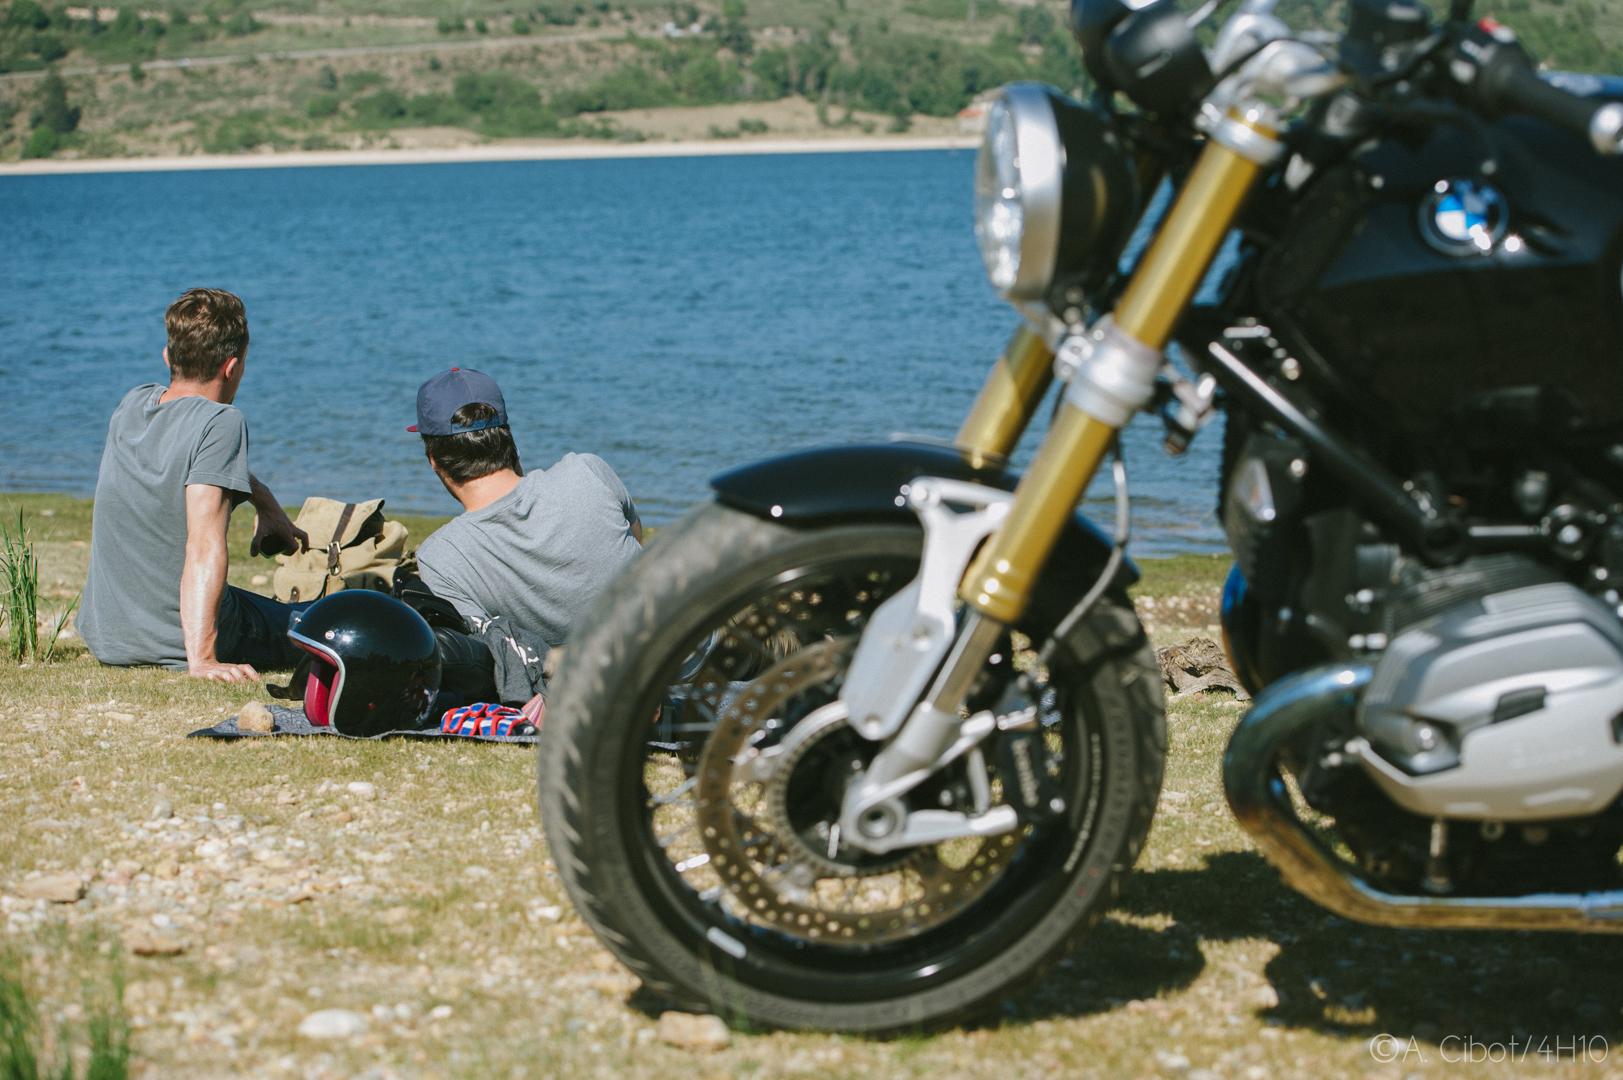 roadtrip-moto-auvergne-saint-flour-cantal-ballade-itineraire-4h10-ninety-scrambler24